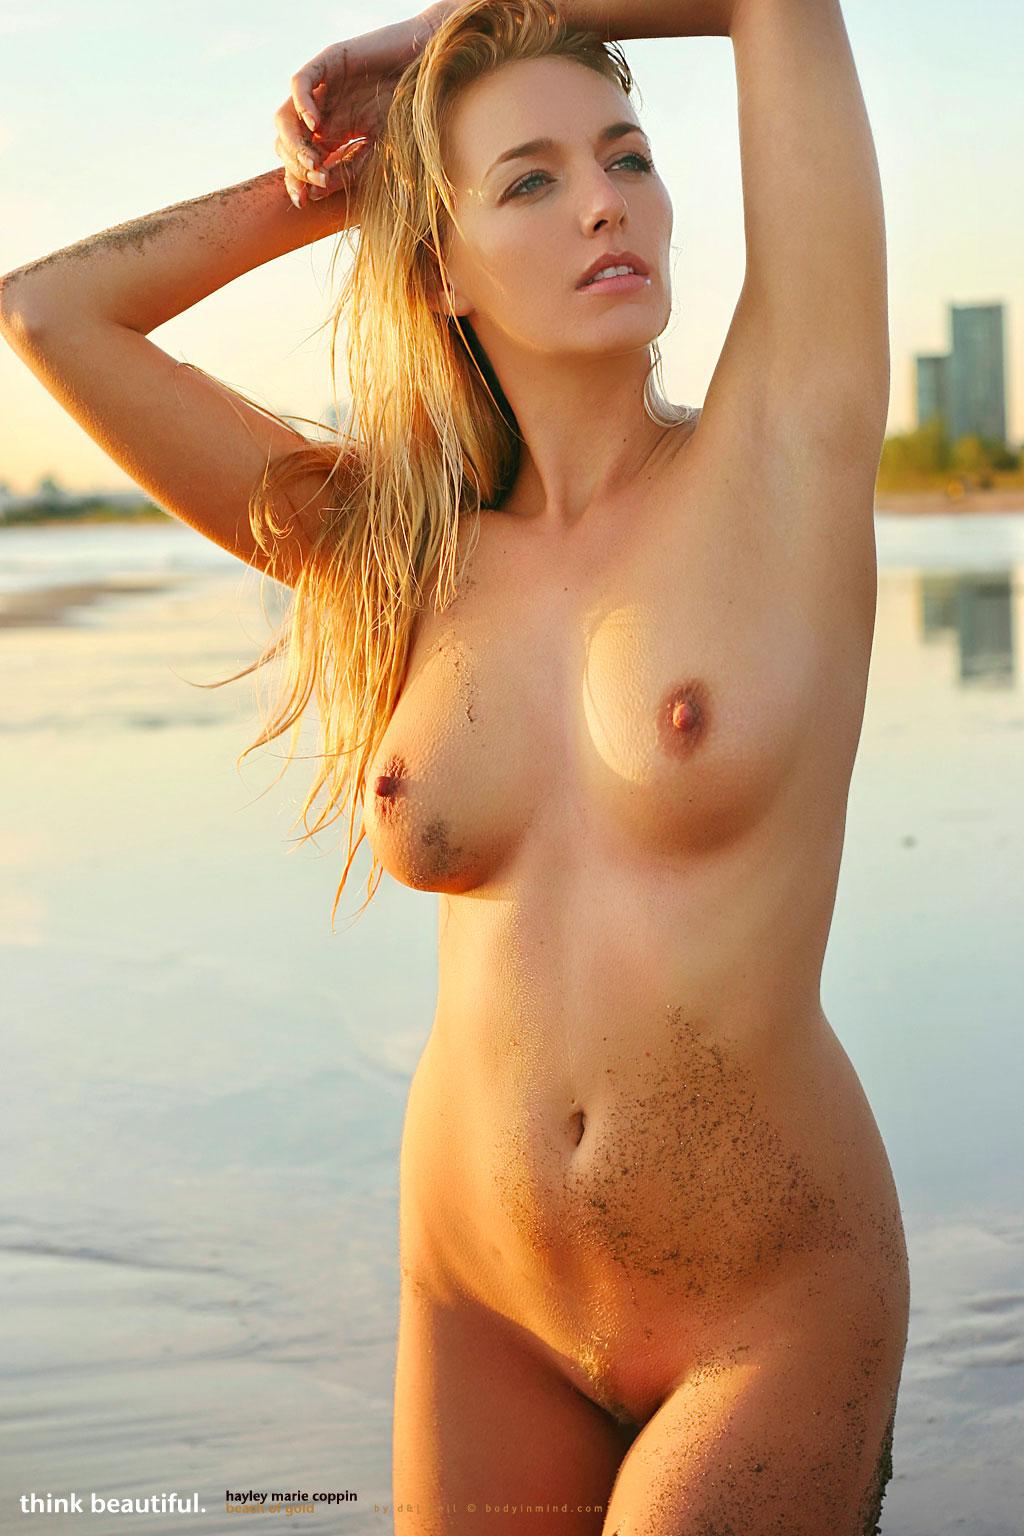 Hayley Beach - NudesPuri.com